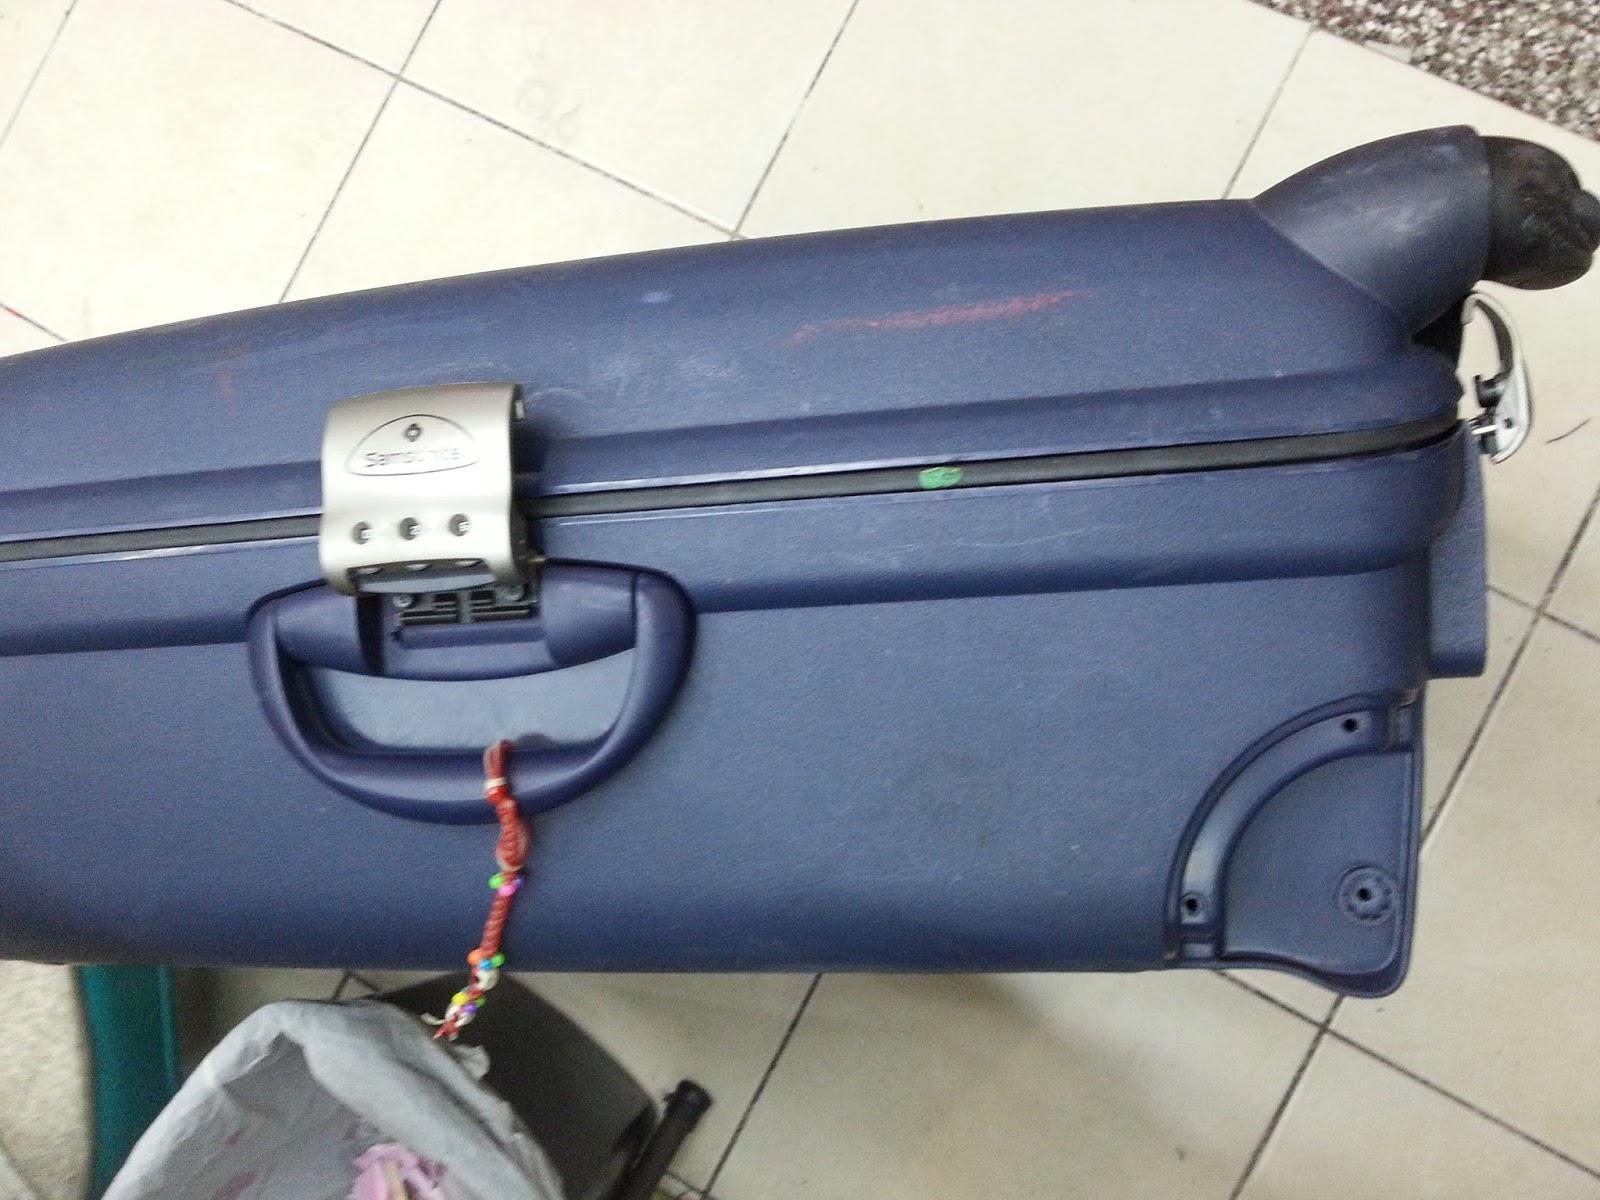 suitcase zipper stuck how to fix